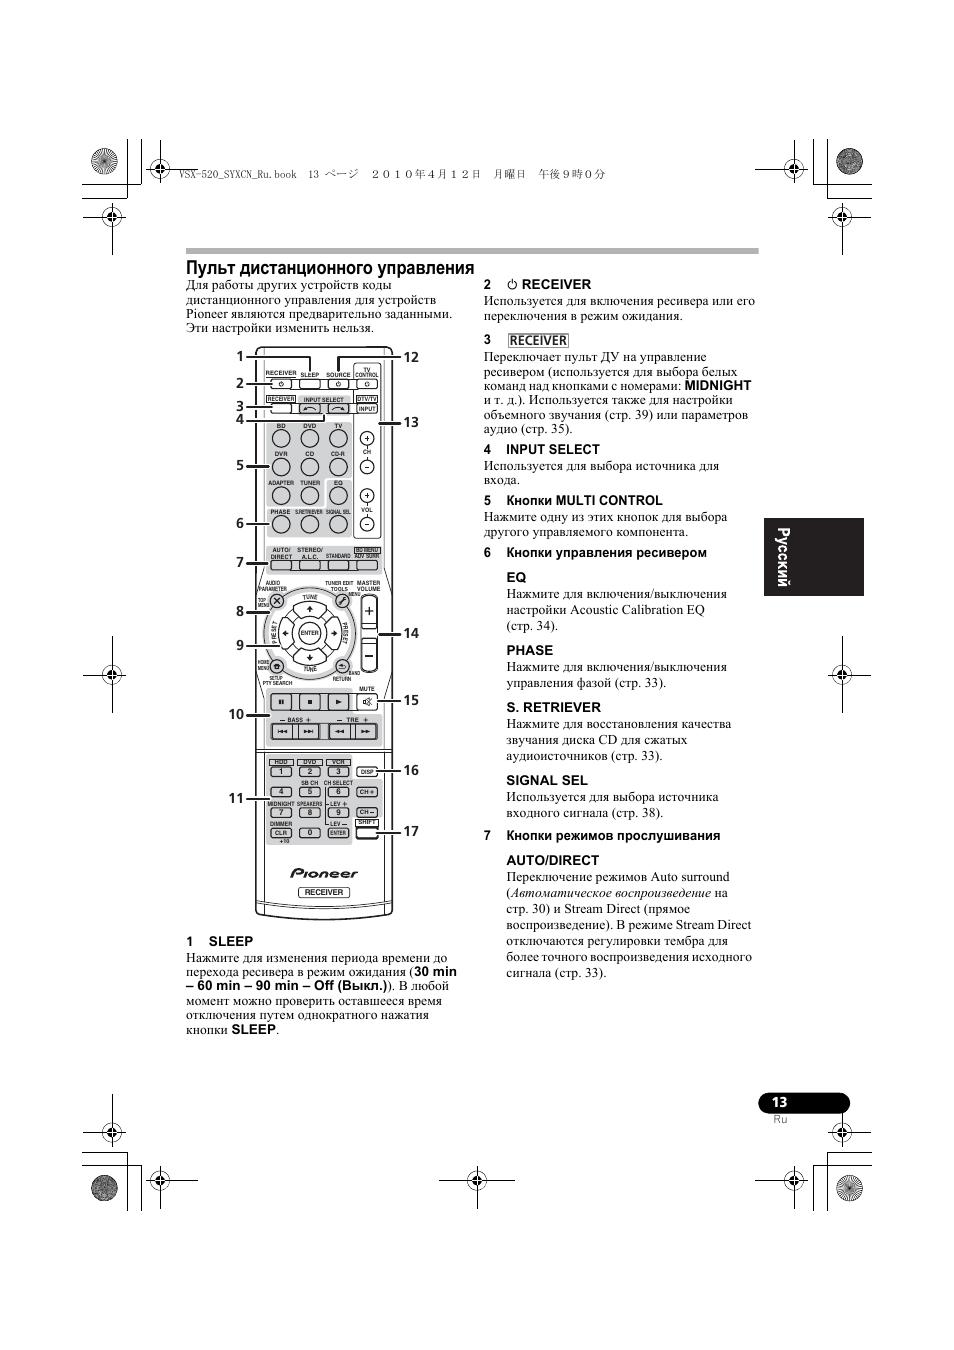 Пульт дистанционного уп²àâëåíèˇ, Пульт дистанционного